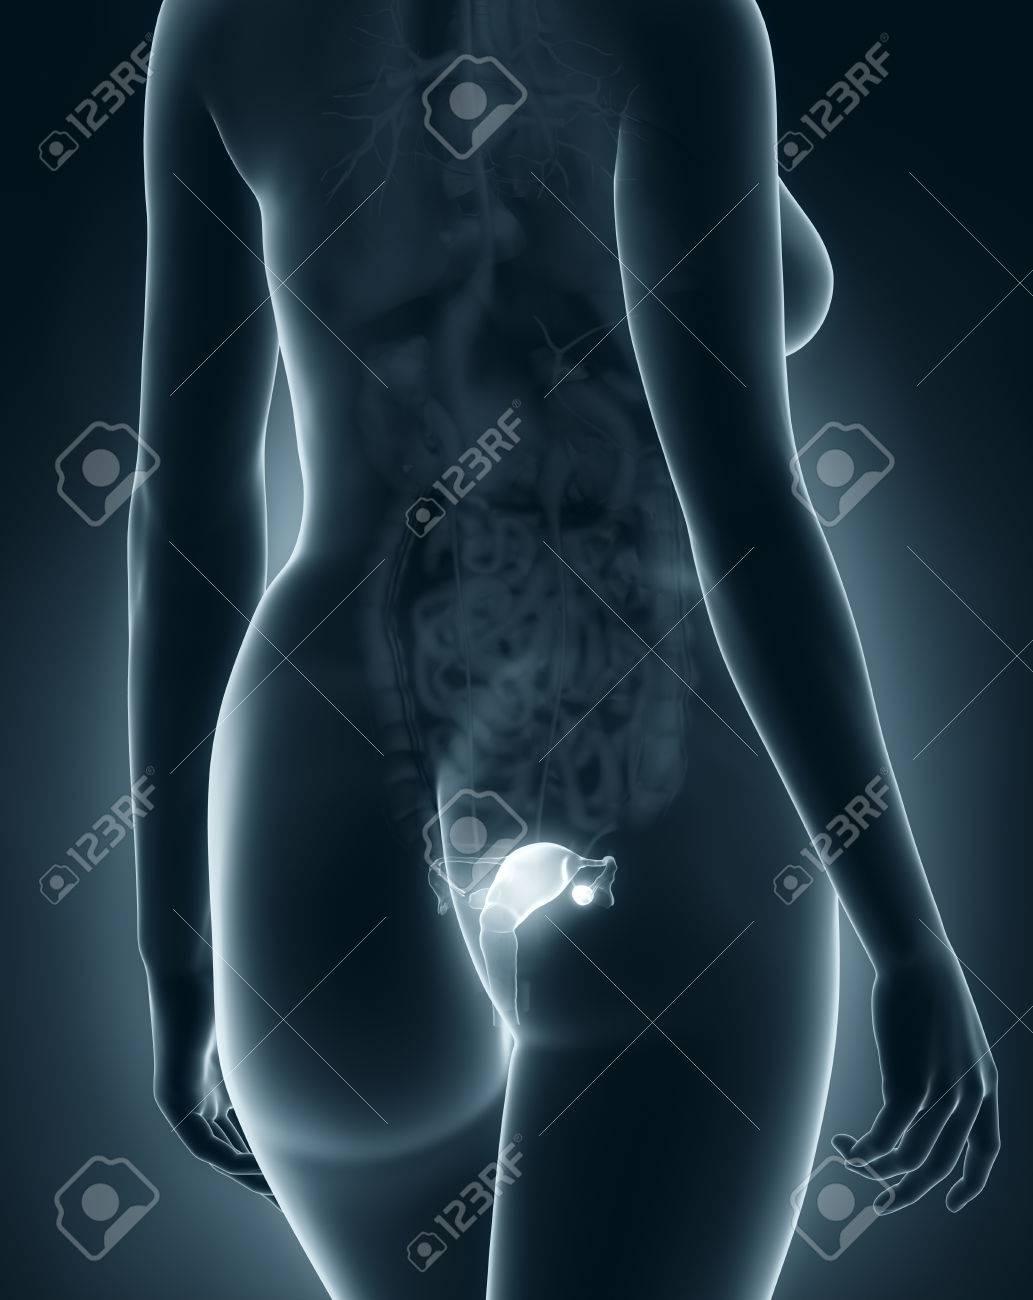 Woman genitalia anatomy x ray black posterior view stock photo woman genitalia anatomy x ray black posterior view stock photo 24341652 pooptronica Image collections